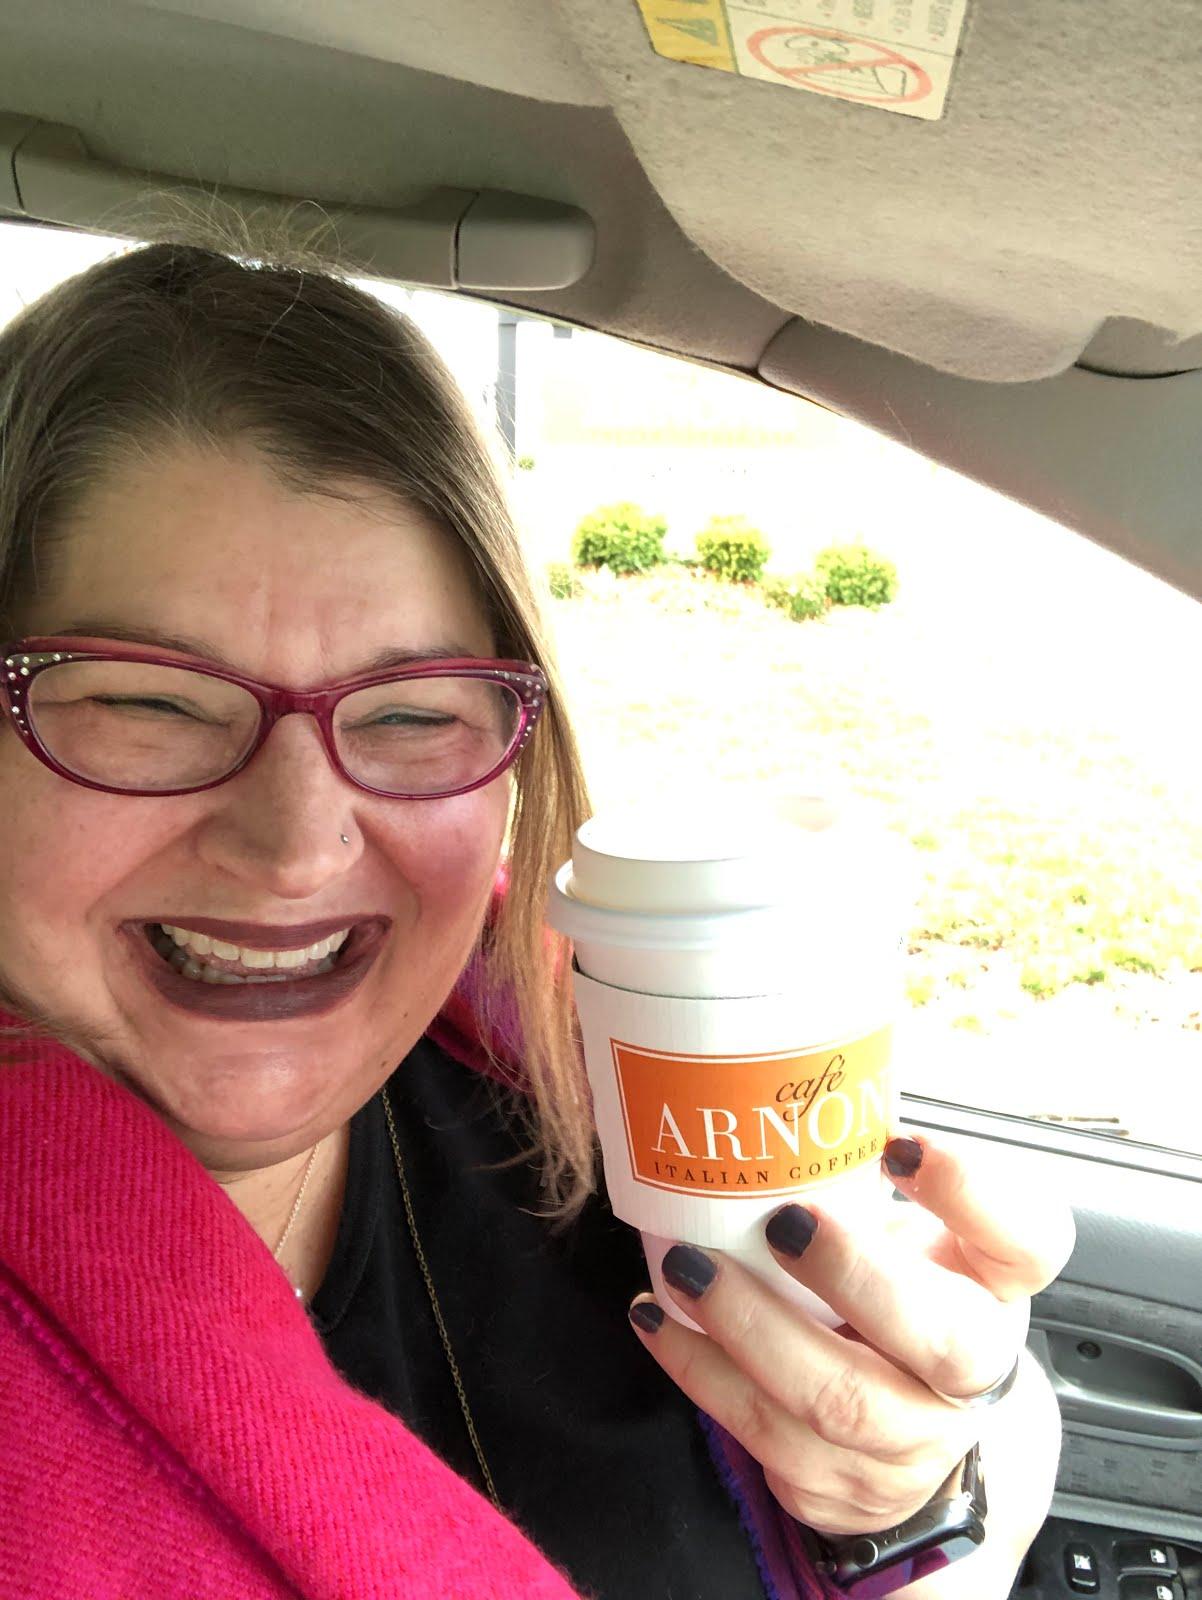 2020 Arnone Cafe, Turmeric Latte Fairlawn, Oh